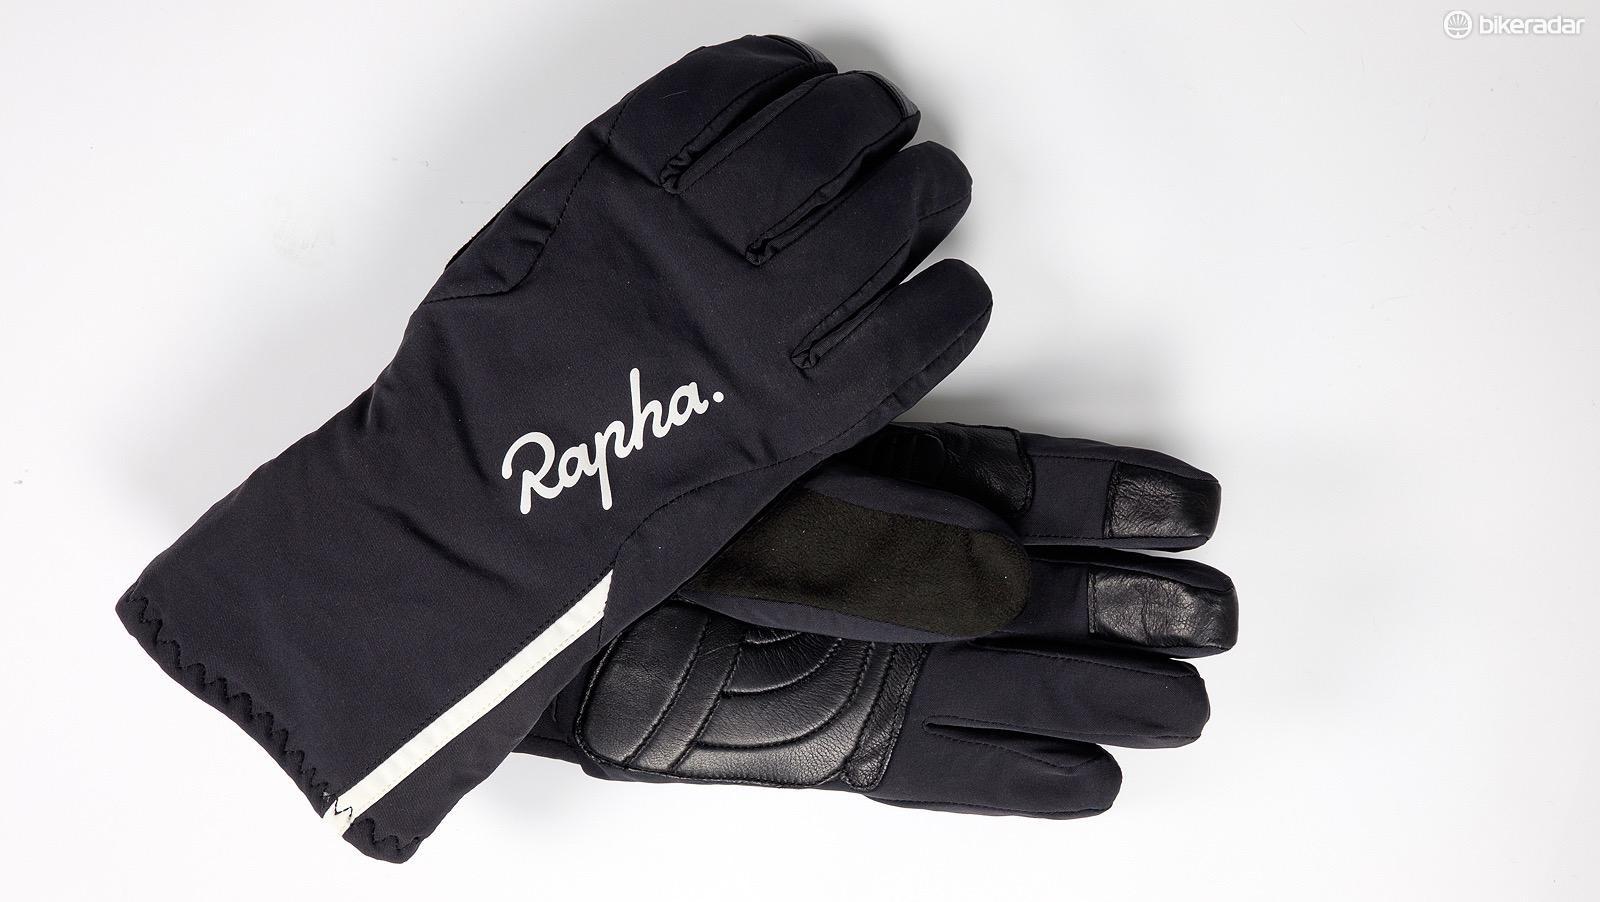 gloves-1-of-6-1510591369531-1fmwn61njf8hs-bd32635